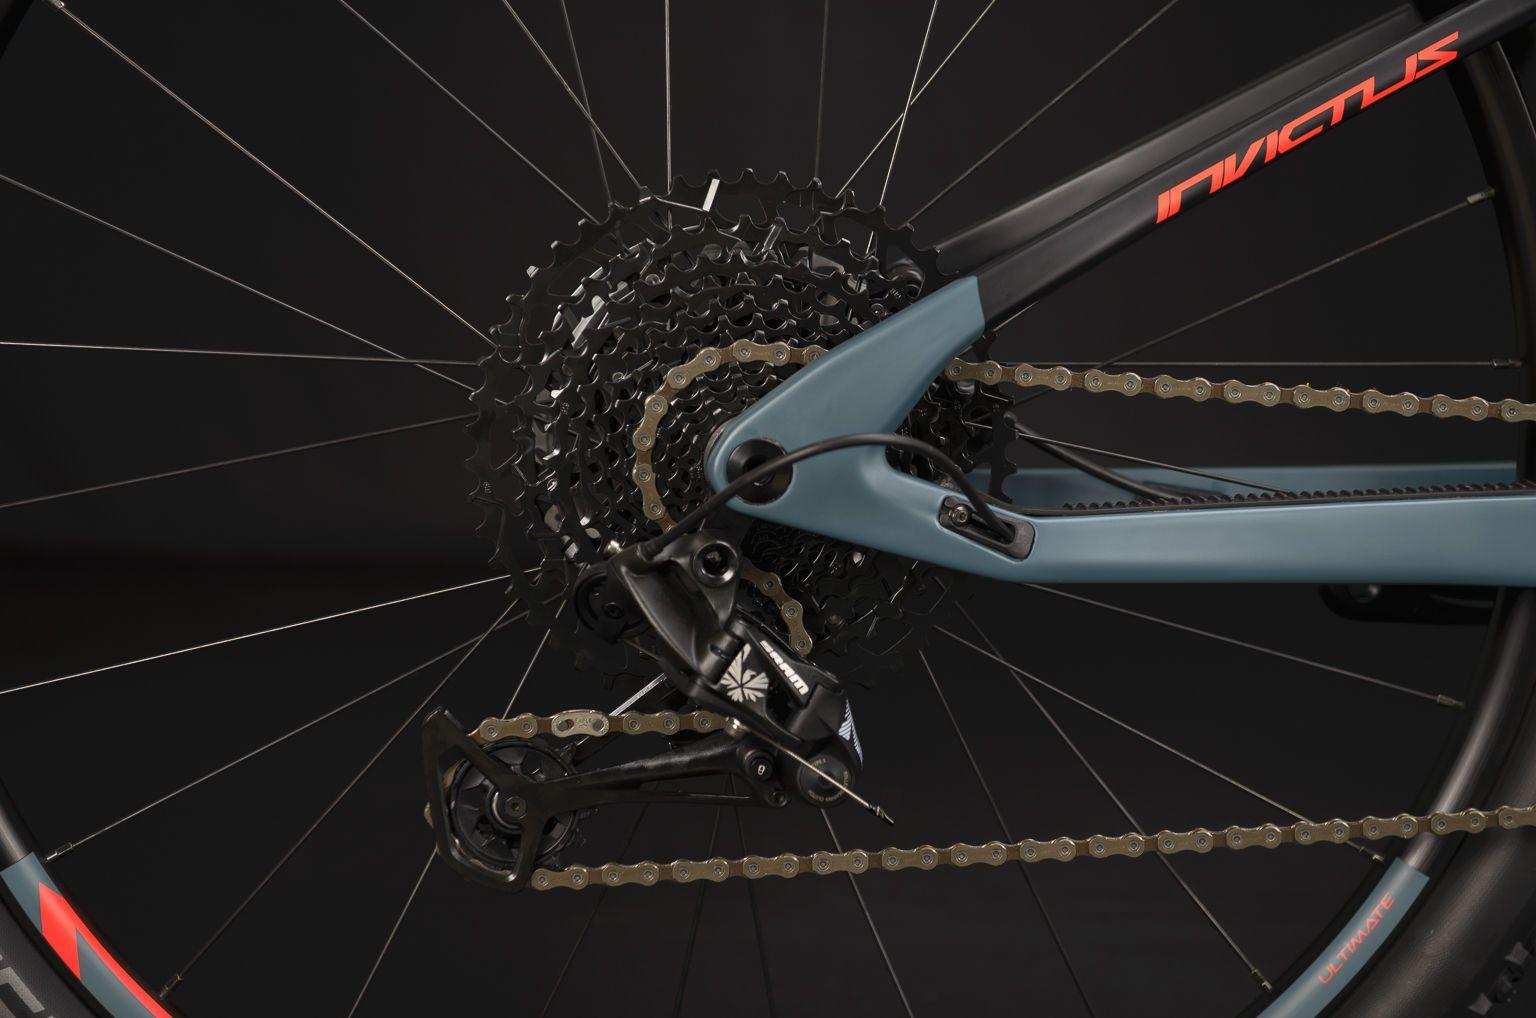 Bicicleta SENSE Invictus Comp 2020 - Vermelho Neon/Chumbo